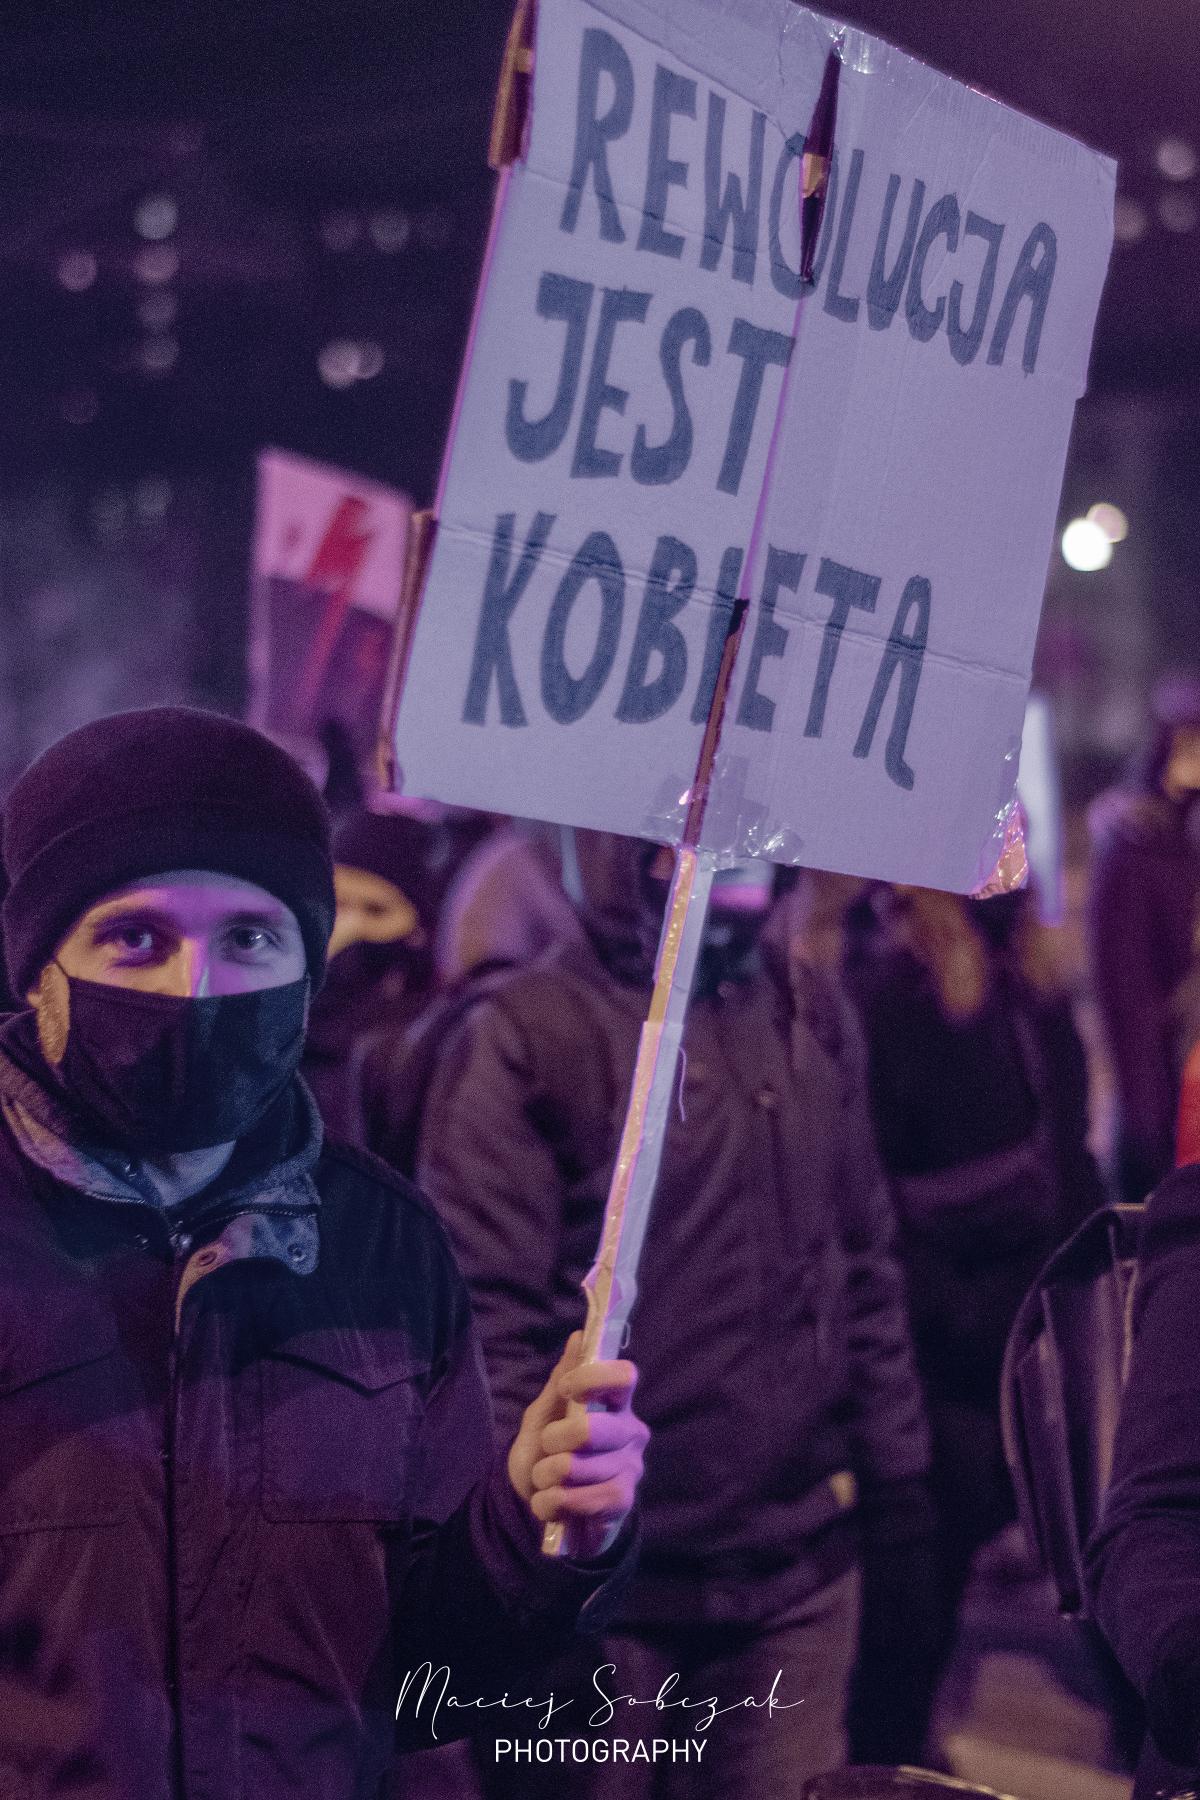 strajk kobiet, Łódź, fotoreportaż, reportaż, street photo, strajk